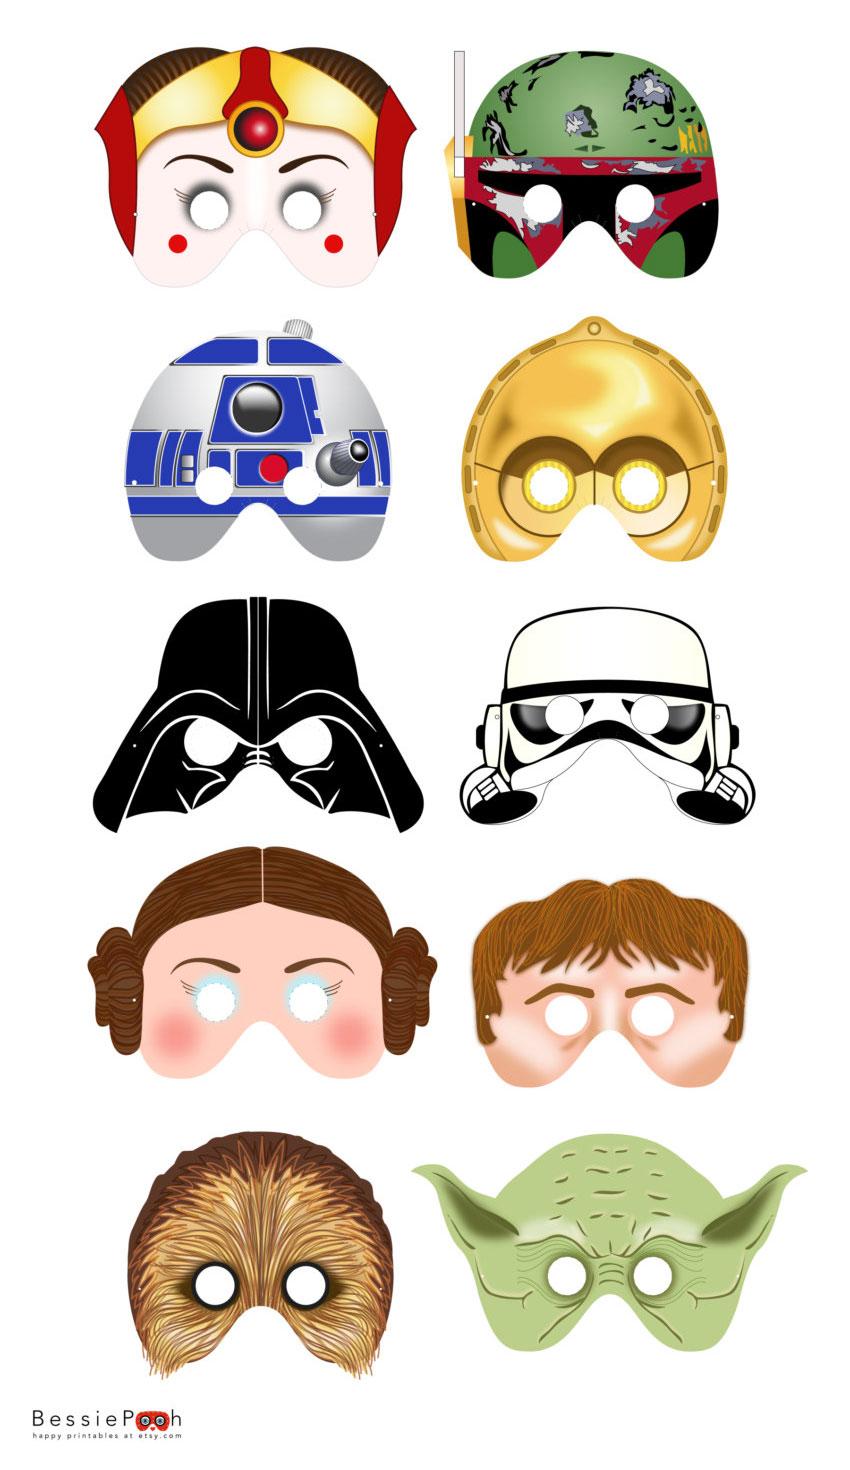 5 Images of Yoda Star Wars Printable Masks